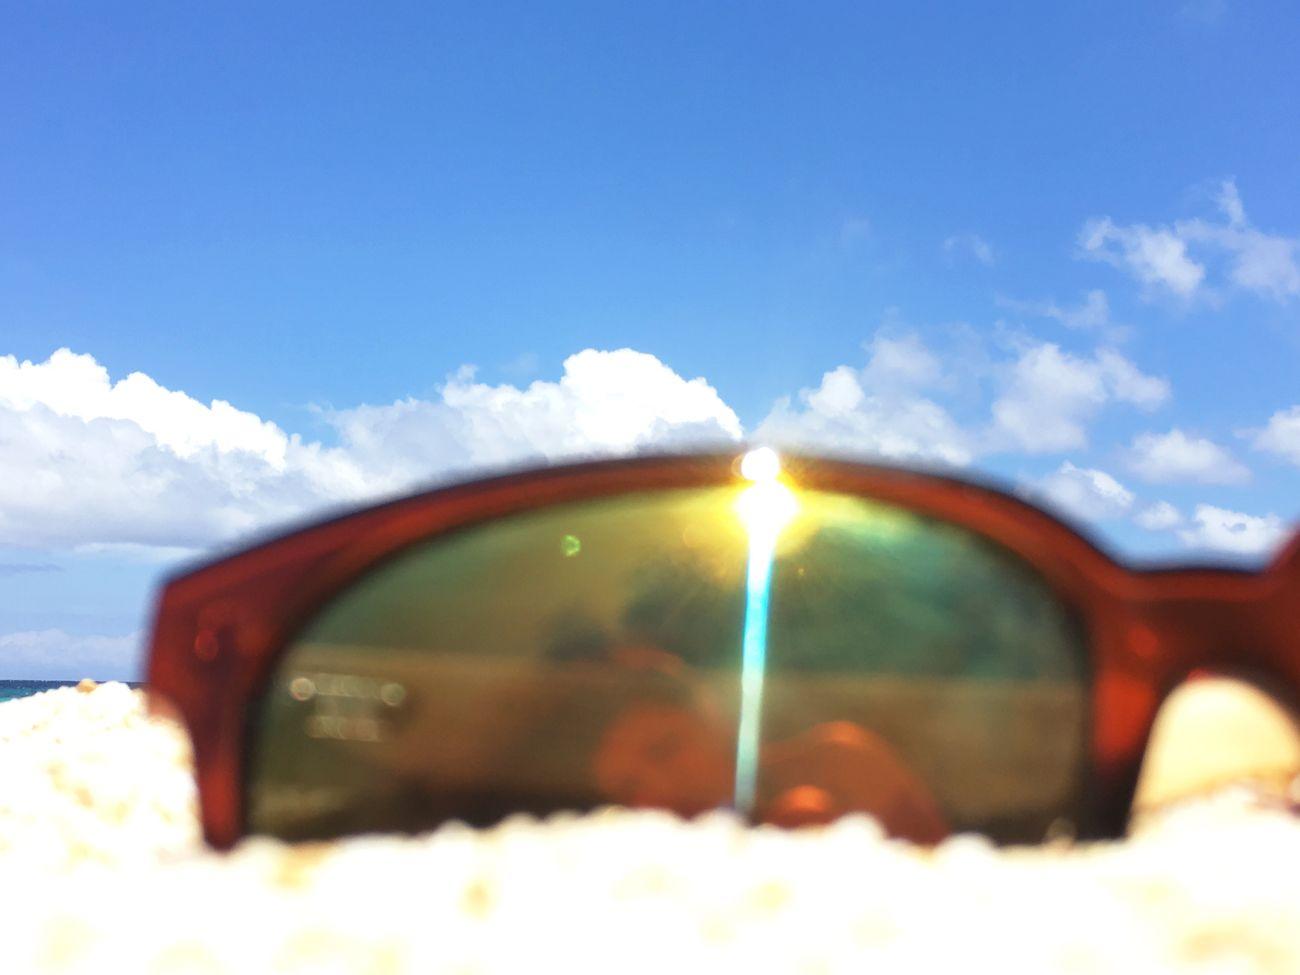 Relaxing Beach Sunglasses